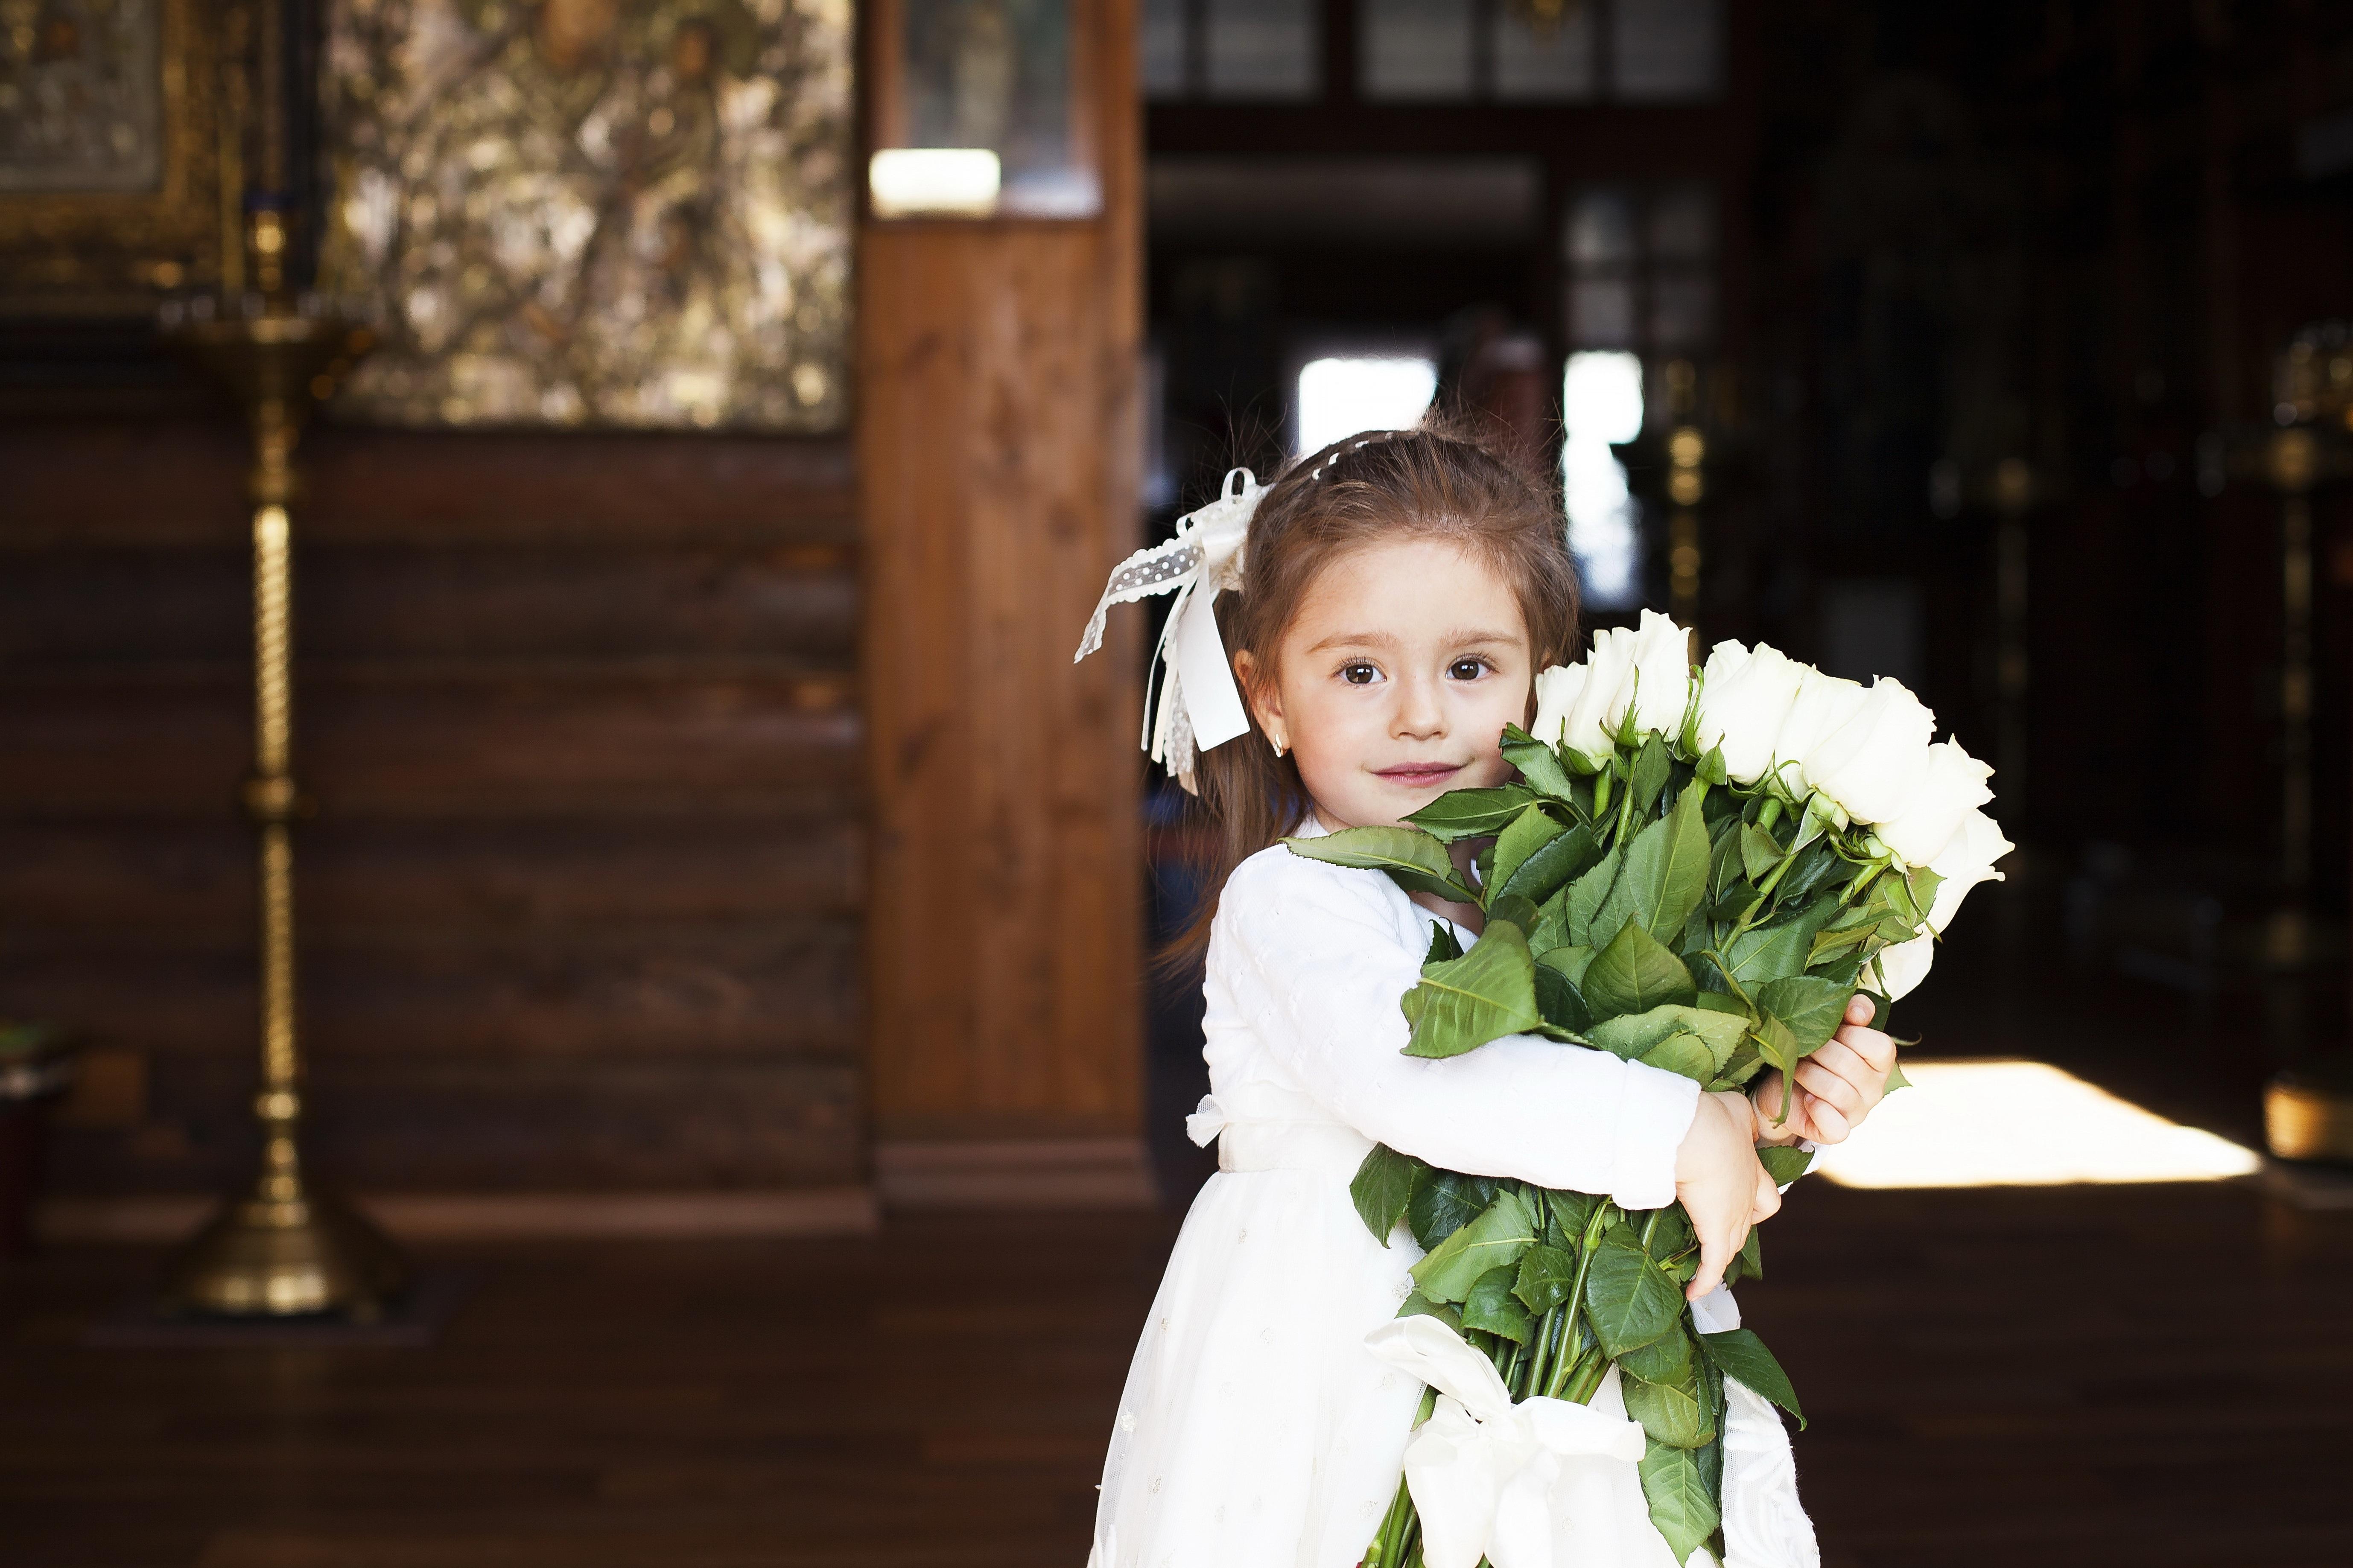 Fotos gratis : persona, niña, mujer, flor, fiesta, niño, Boda, novia ...